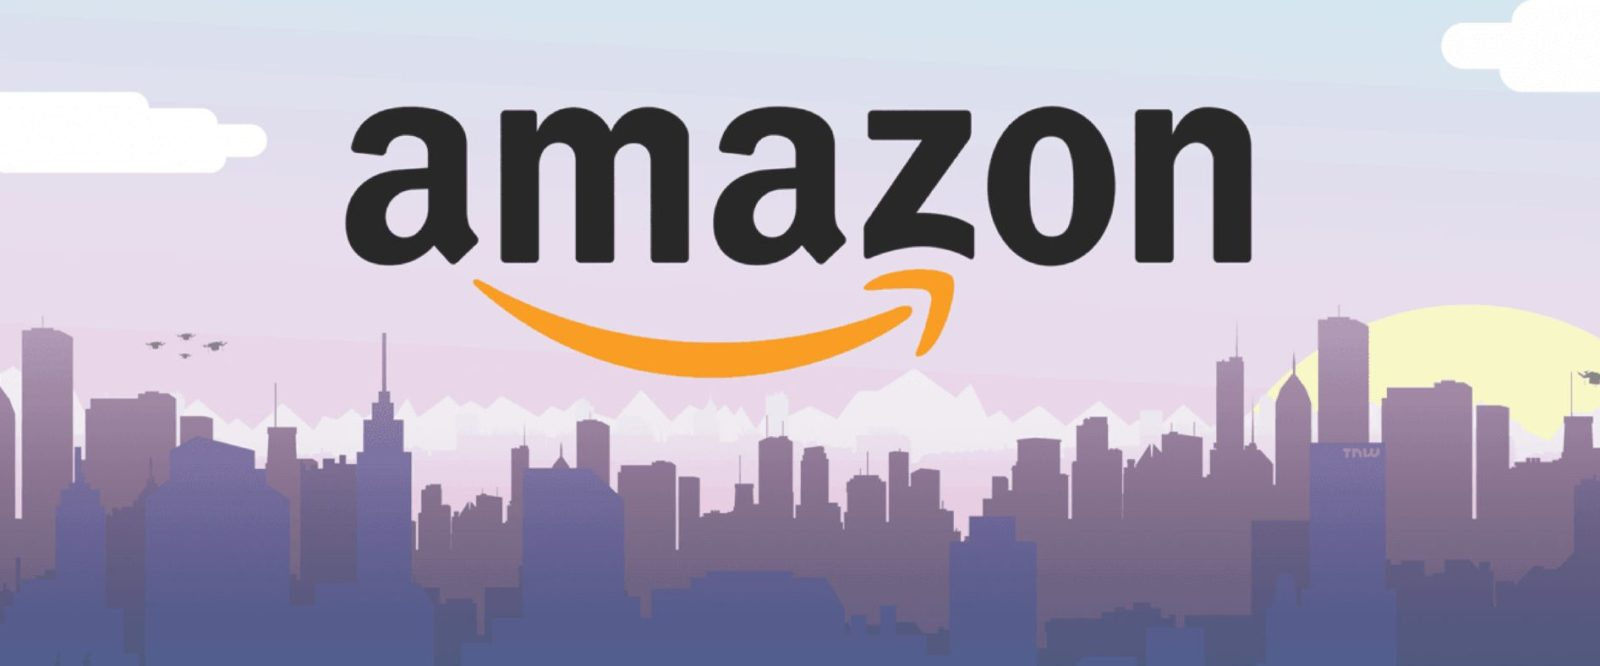 Amazon готова приобрести студию Metro Goldwyn Mayer